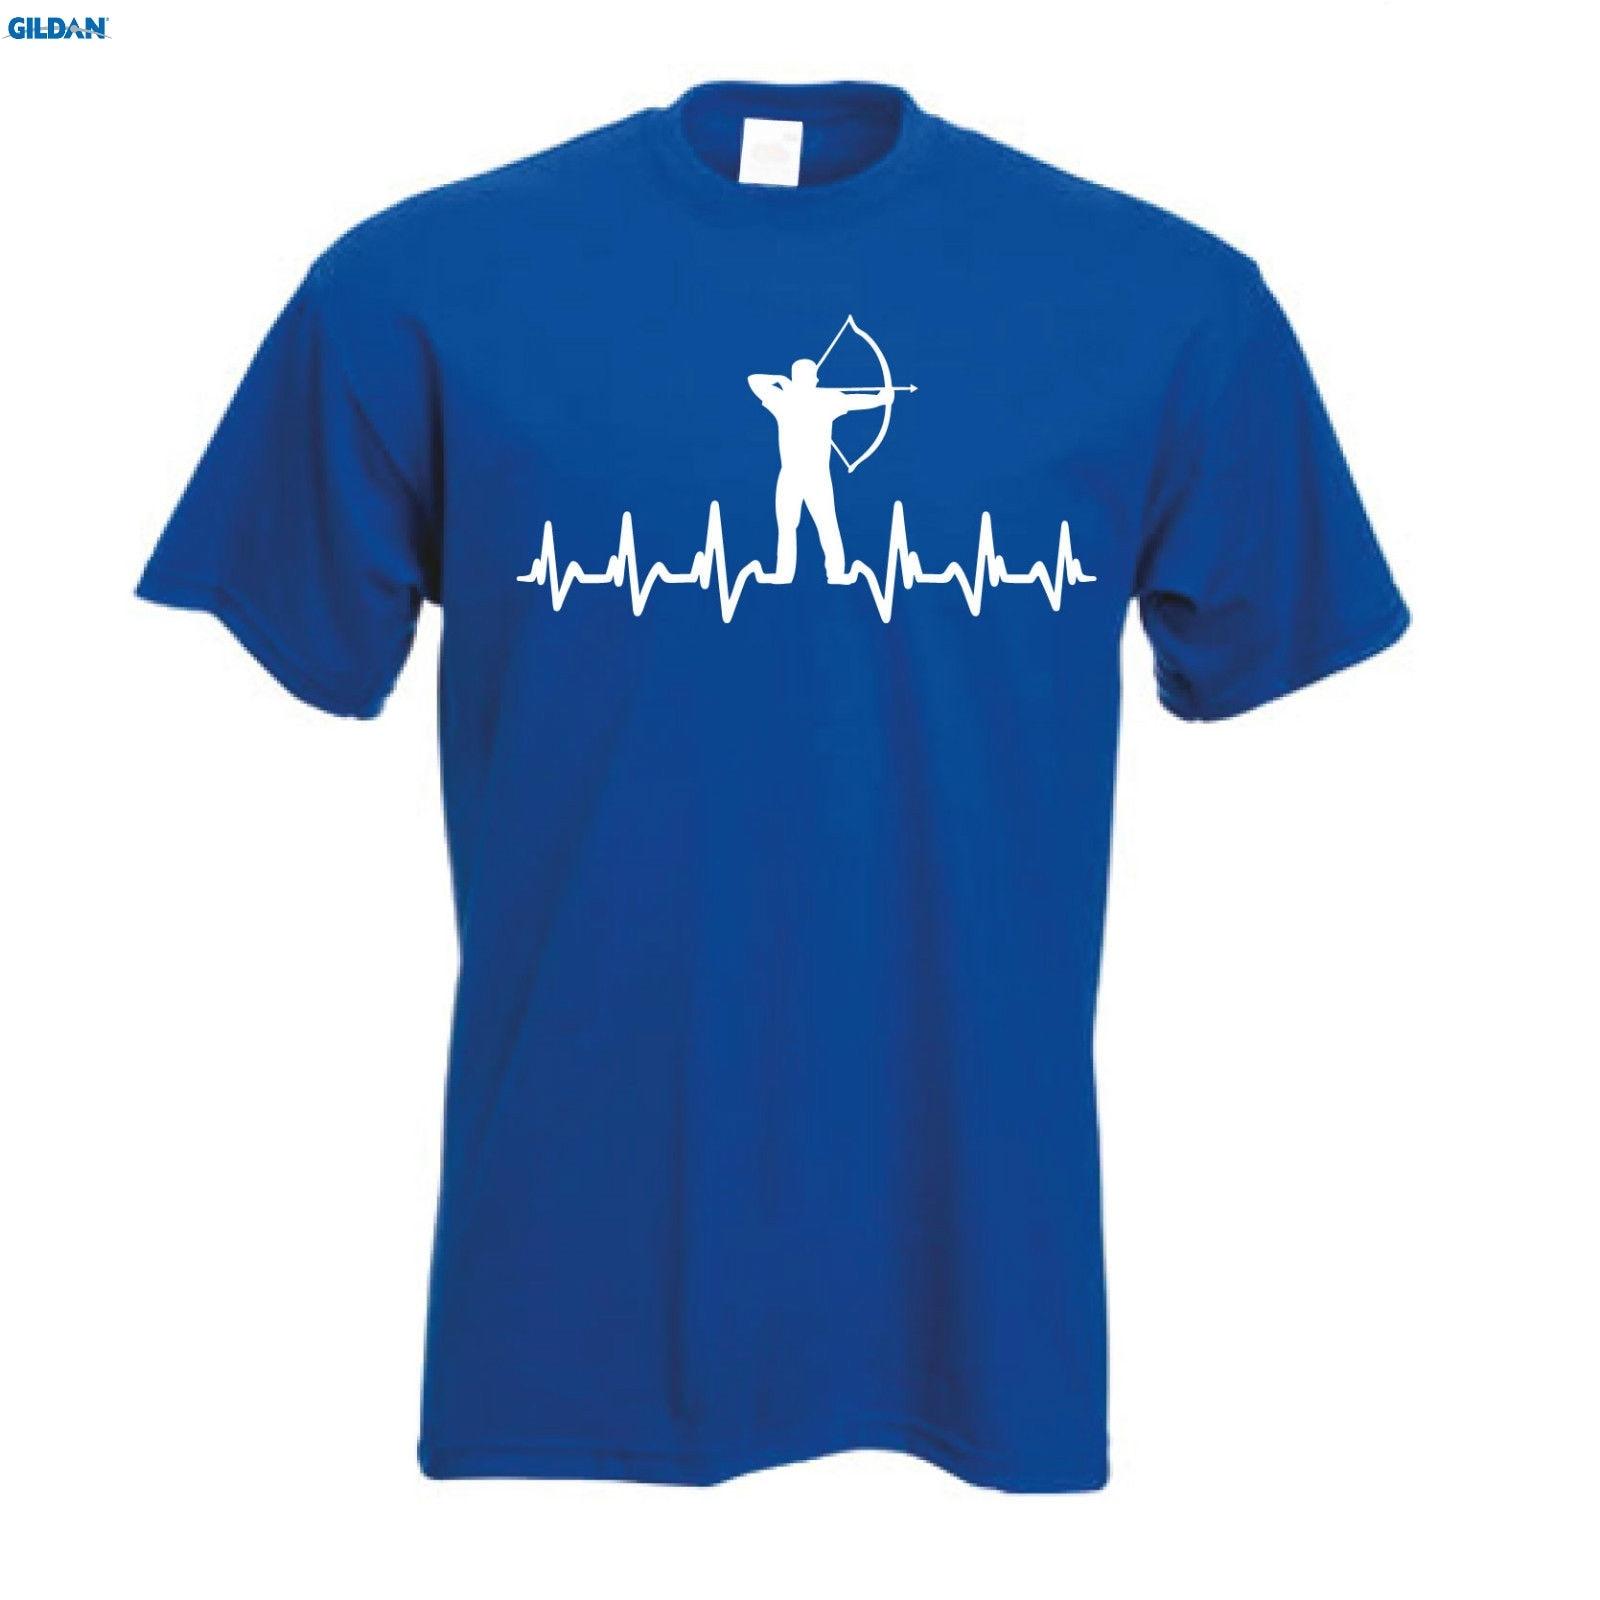 GILDAN Its In My Archery T Shirt Bow & Arrow T-Shirt FREE UK P&P Good Quality Brand Cotton Shirt Summer Style Cool Punk Tops